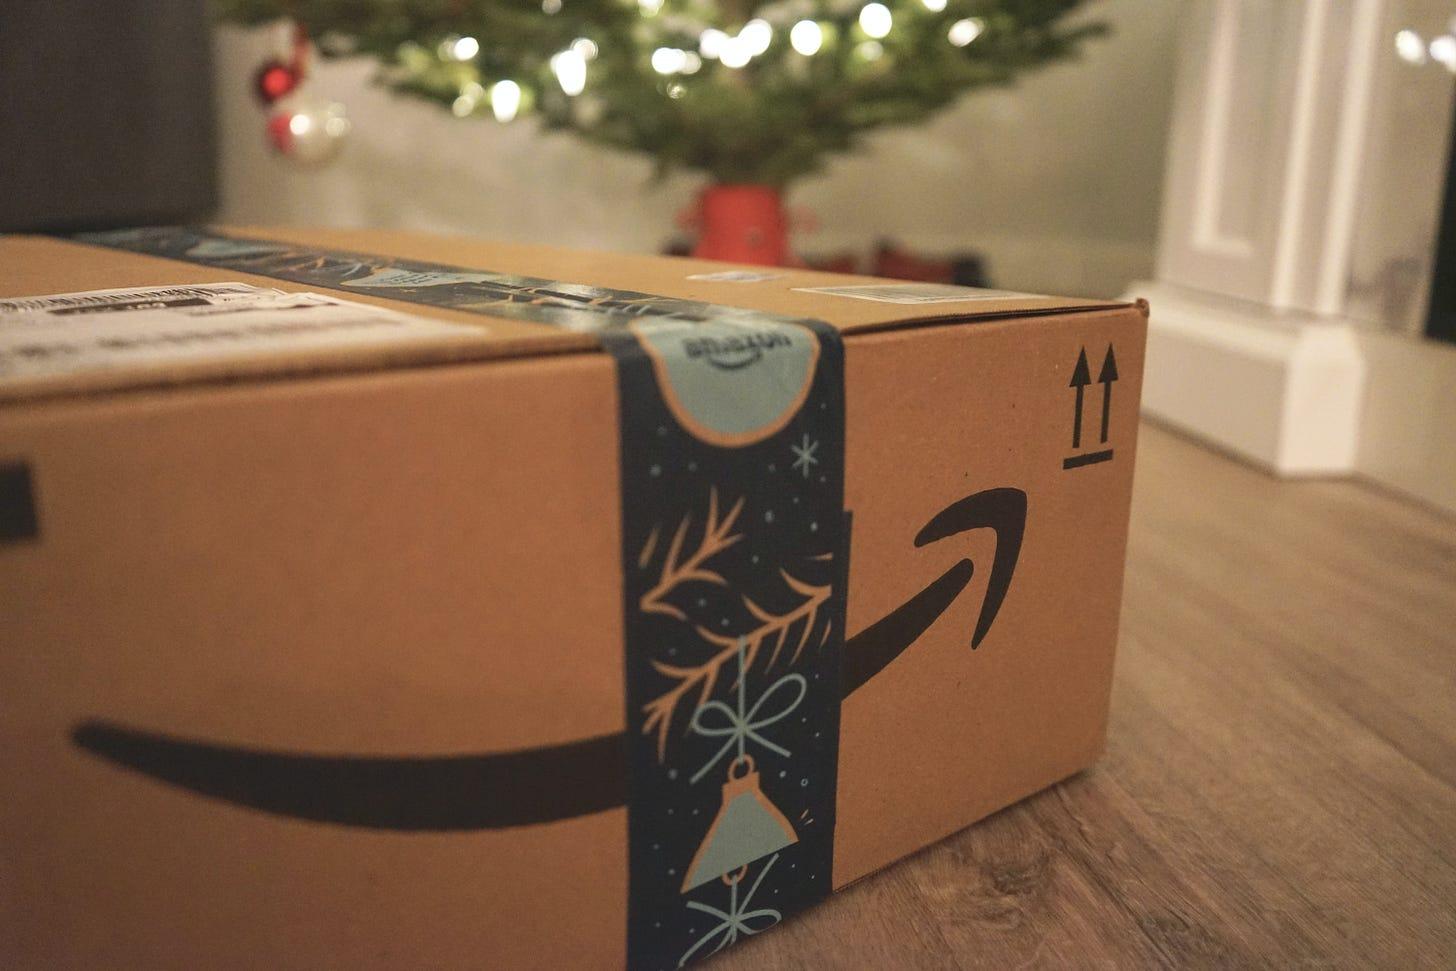 Photo of an Amazon box under a Christmas tree. Wicked Monday / Unsplash